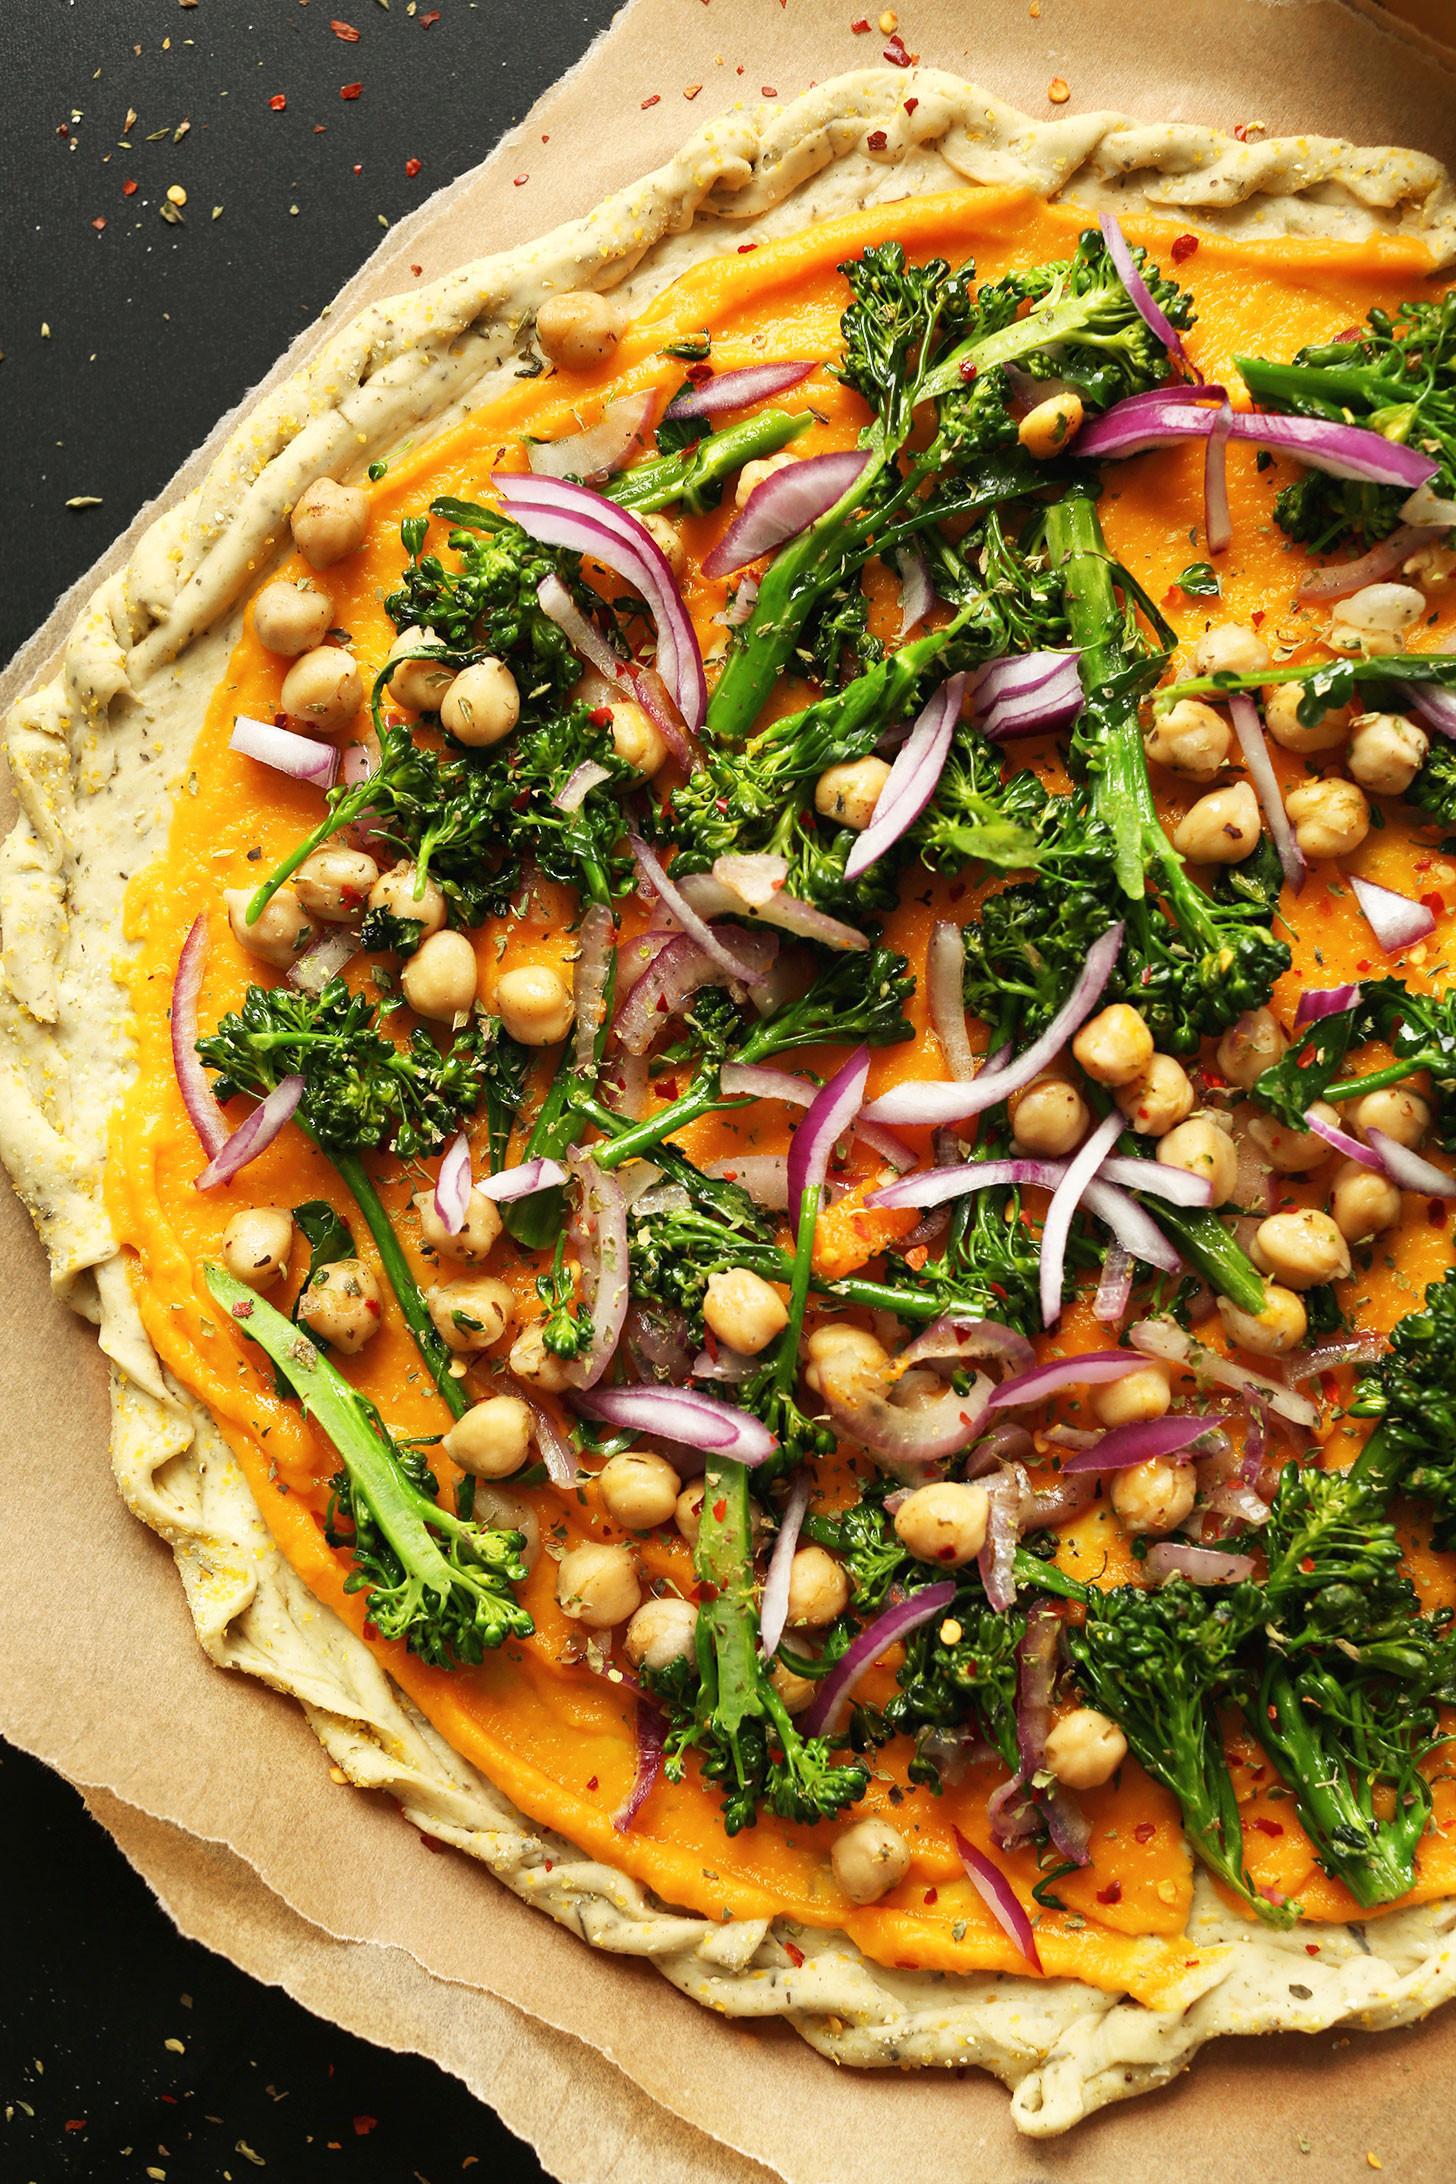 Best Healthy Vegan Recipes  Ultimate Vegan Pizza Recipe Round Up